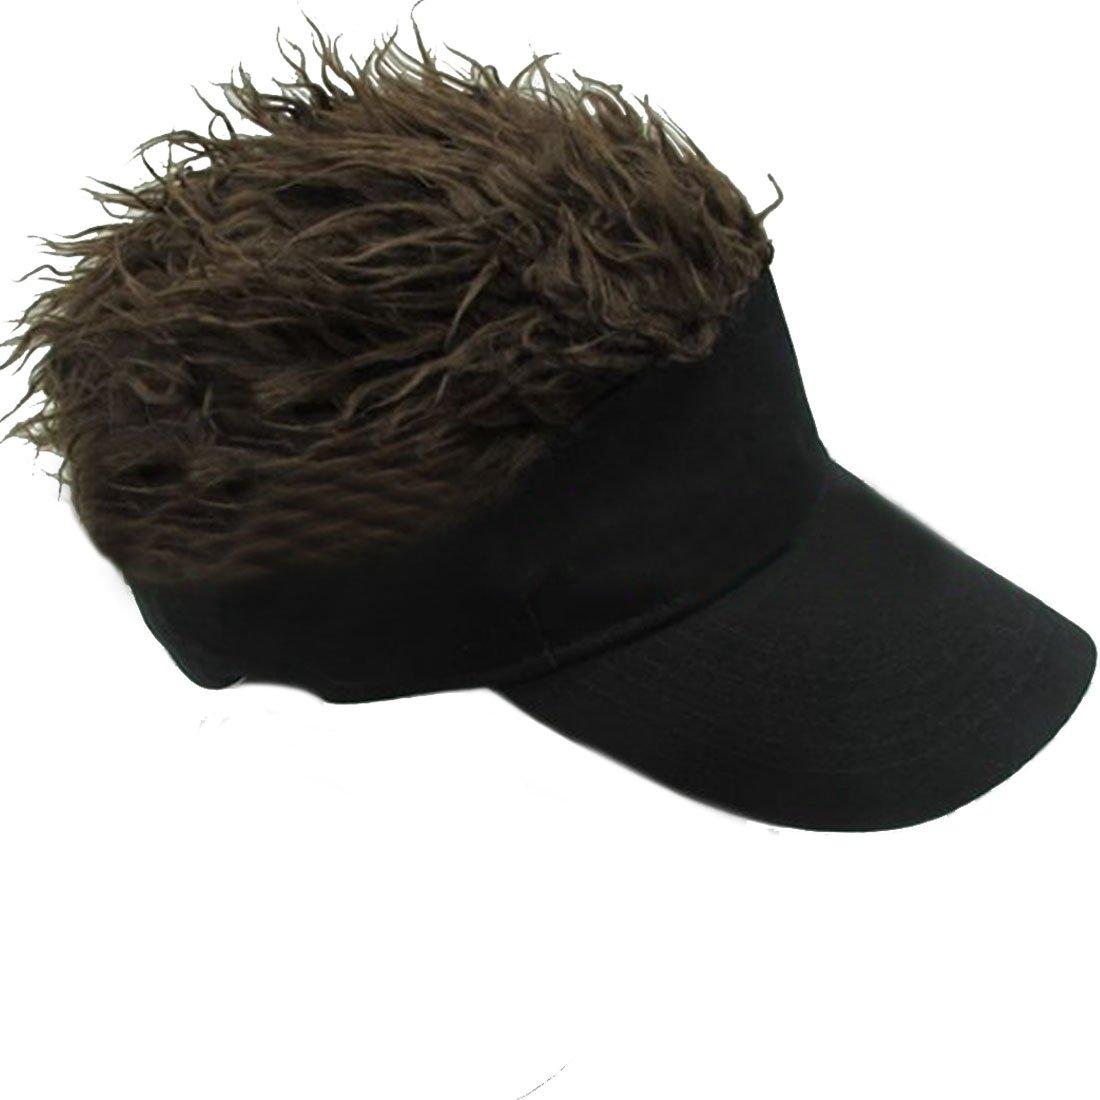 Lerben Funny Sun Visor Cap Wig Peaked Hat Adjustable Baseball Cap SUG-05282